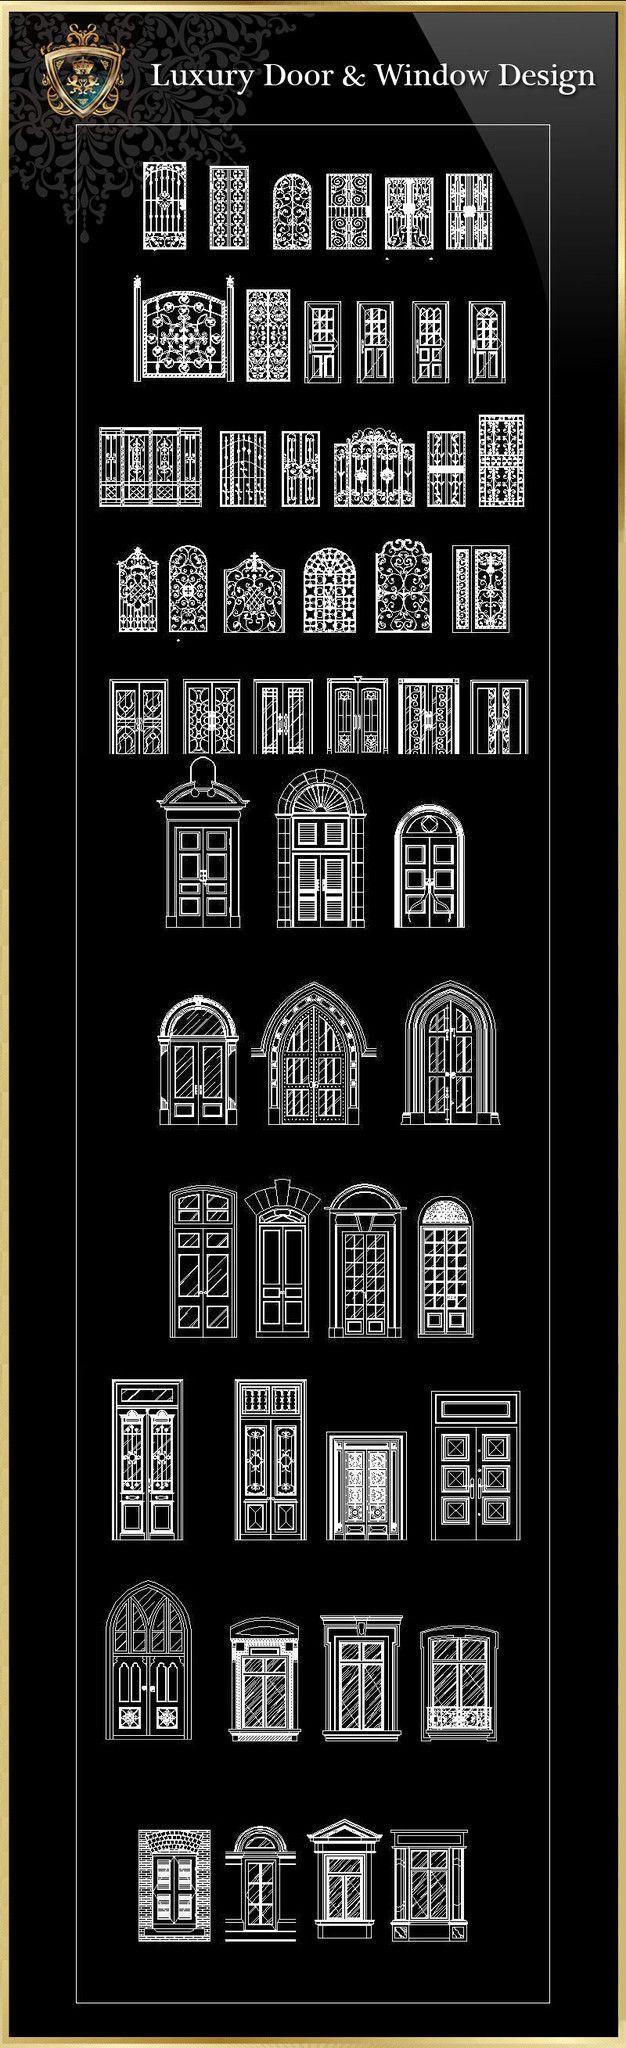 Royal Architecture Door & Window Design – CAD Design | Free CAD Blocks,Drawings,Details